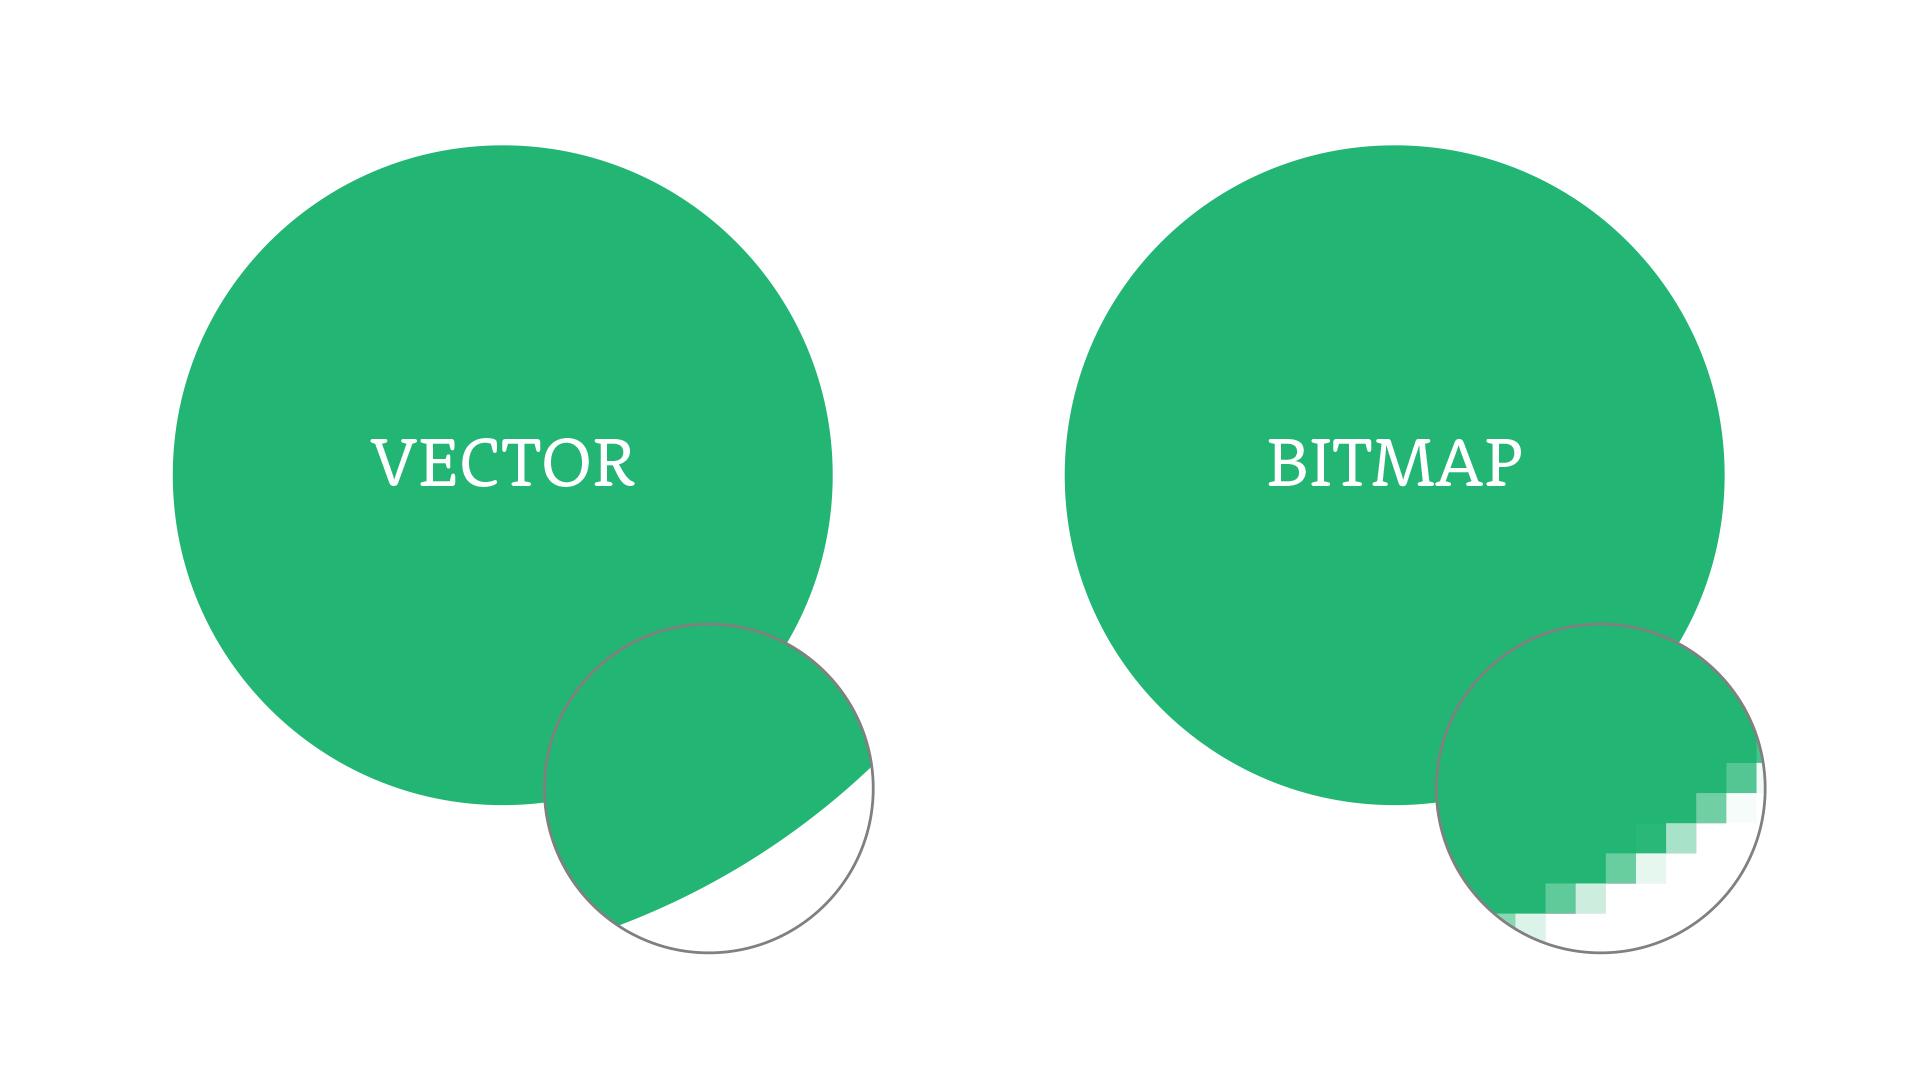 Vector vs Bitmap Image